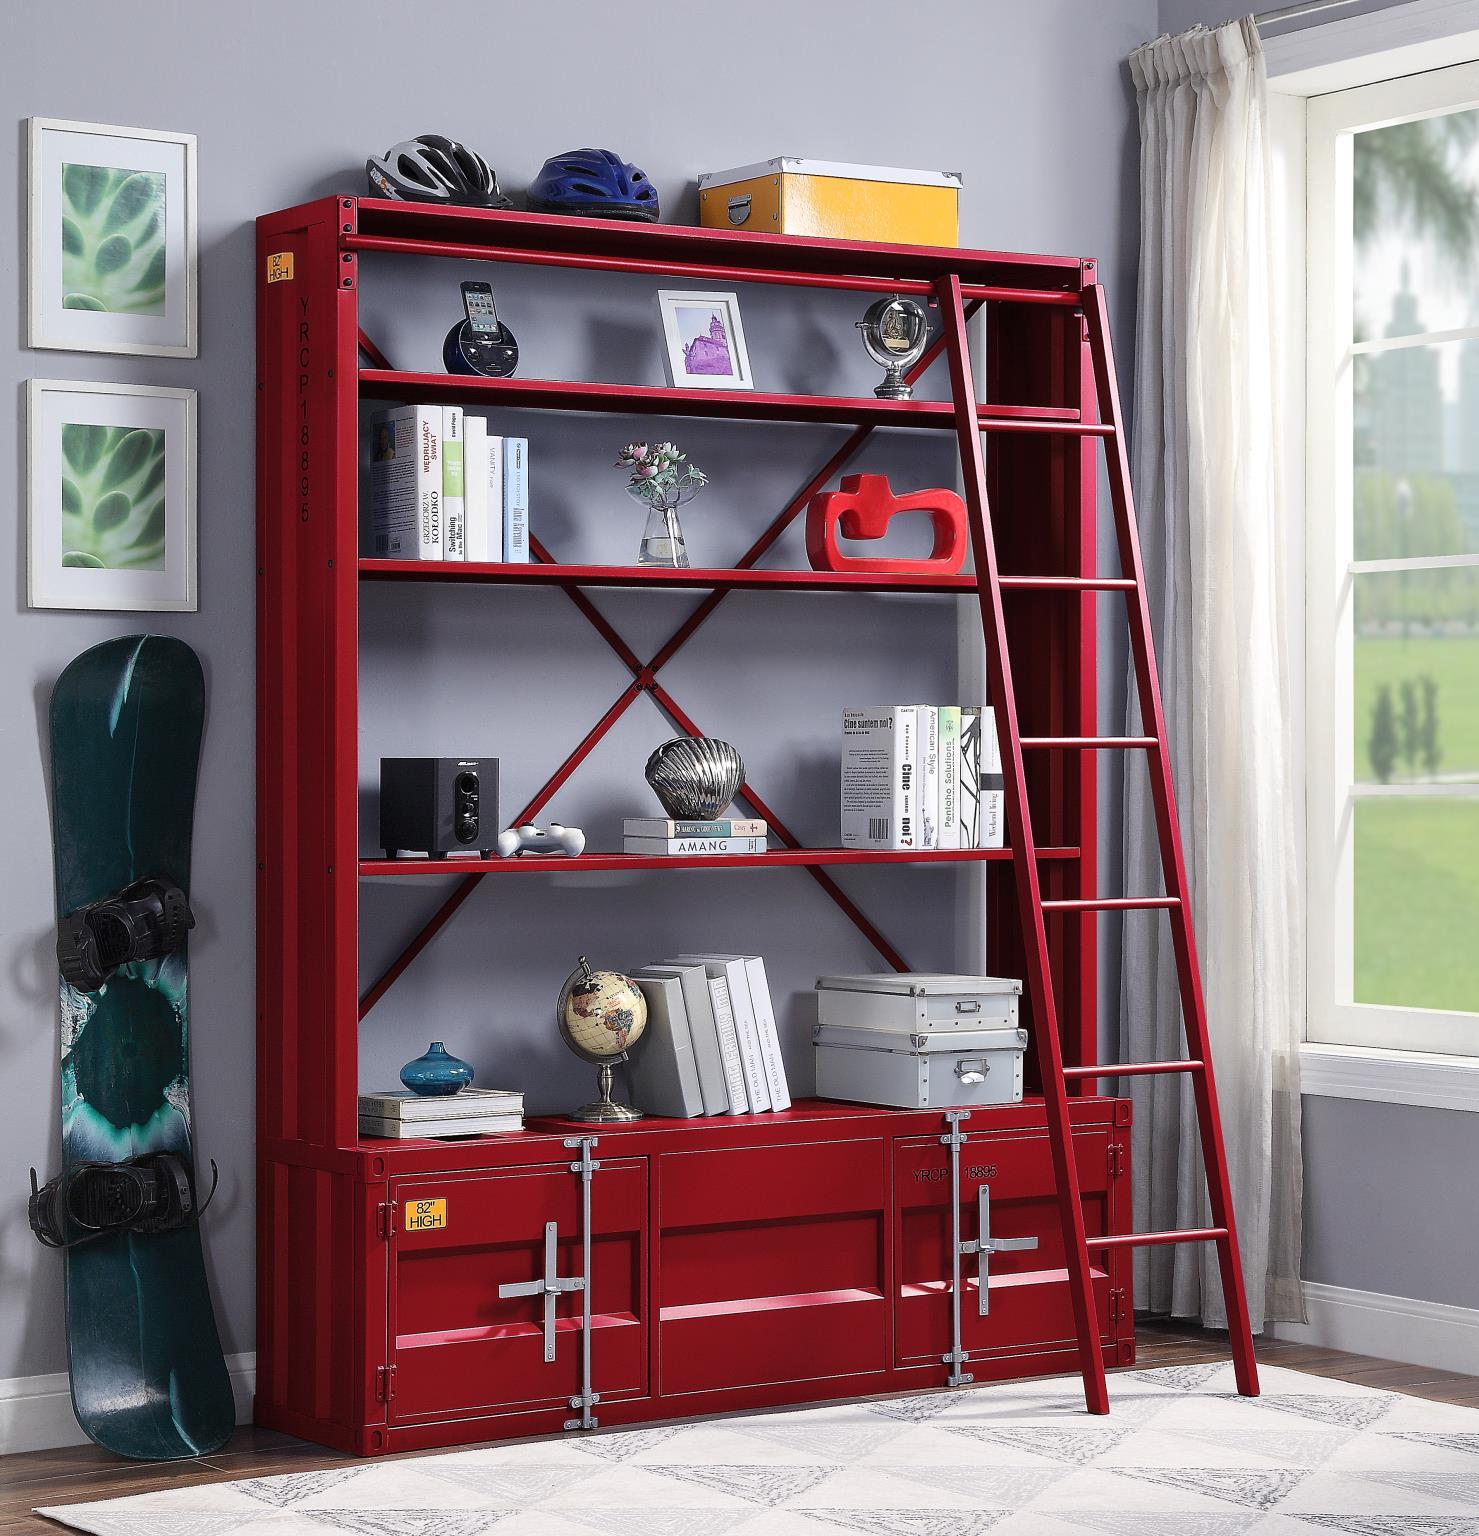 Red Bookshelf w/ Ladder